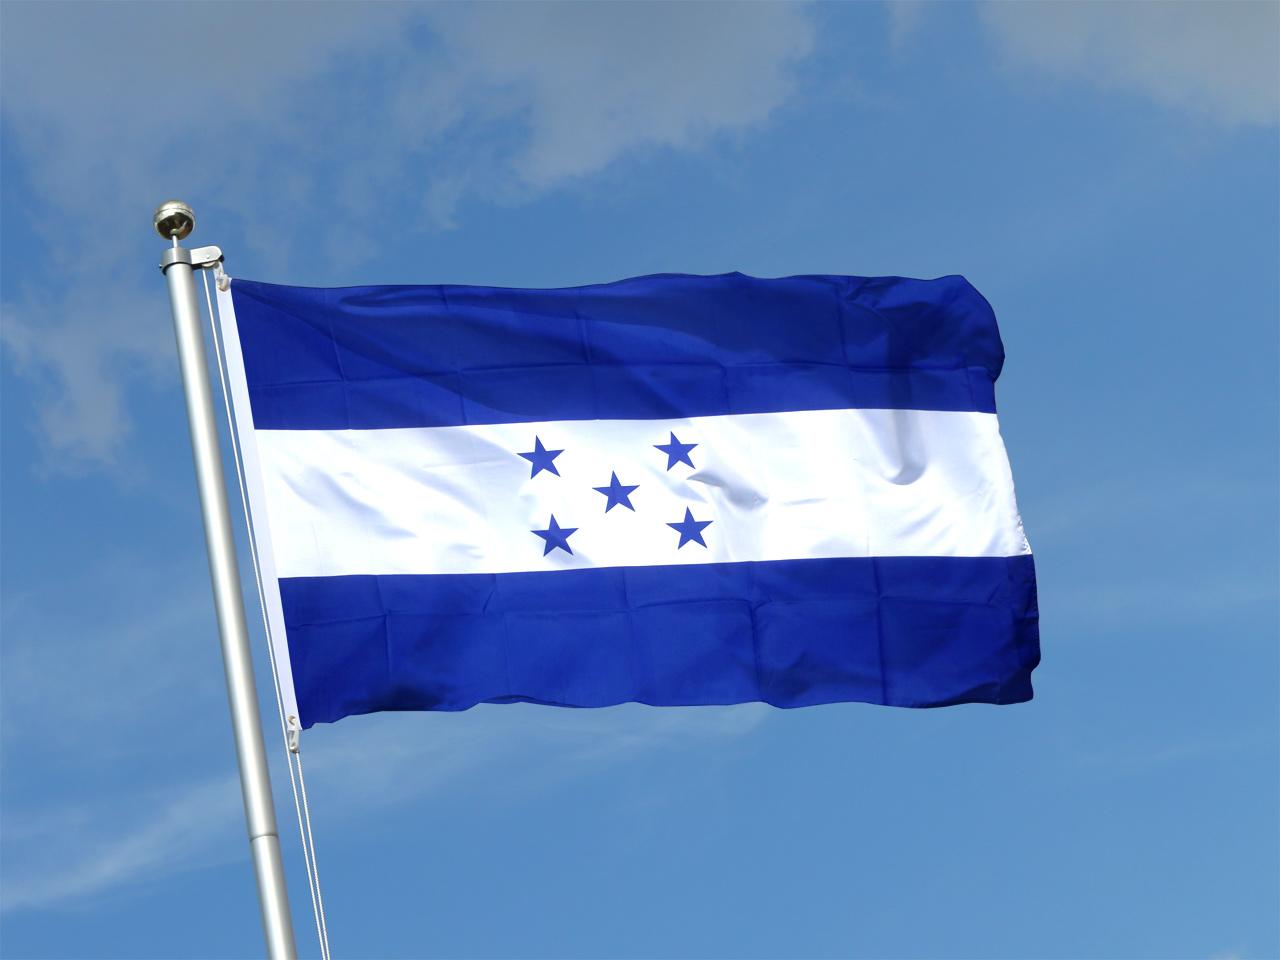 флаг гондураса фото для всей